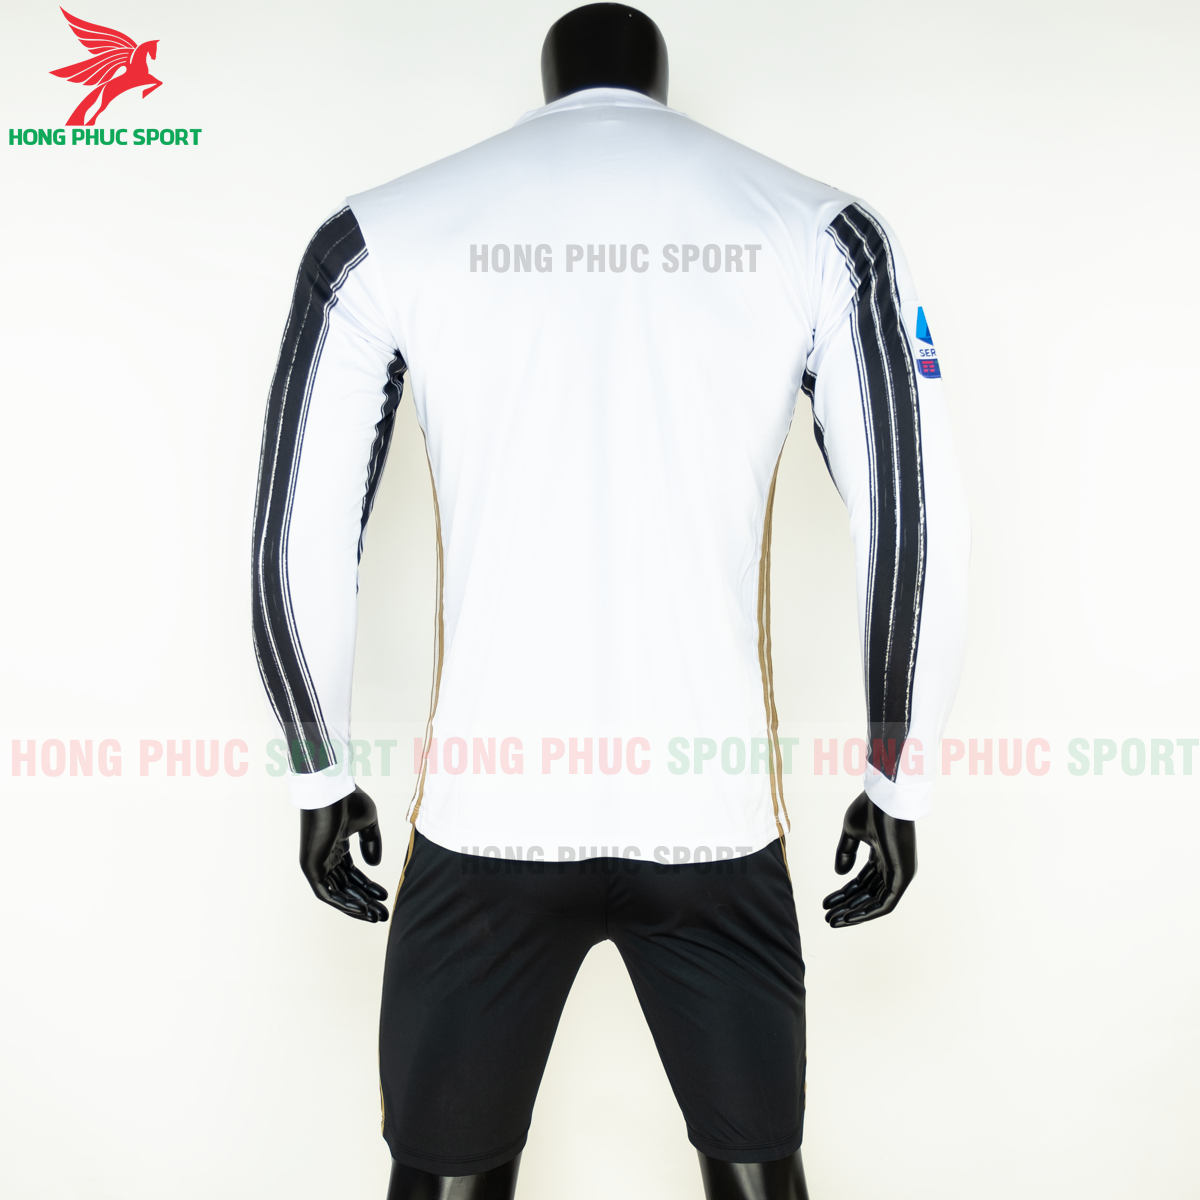 https://cdn.hongphucsport.com/unsafe/s4.shopbay.vn/files/285/ao-dai-tay-juventus-2020-san-nha-8-5f8fbde67c2a5.png